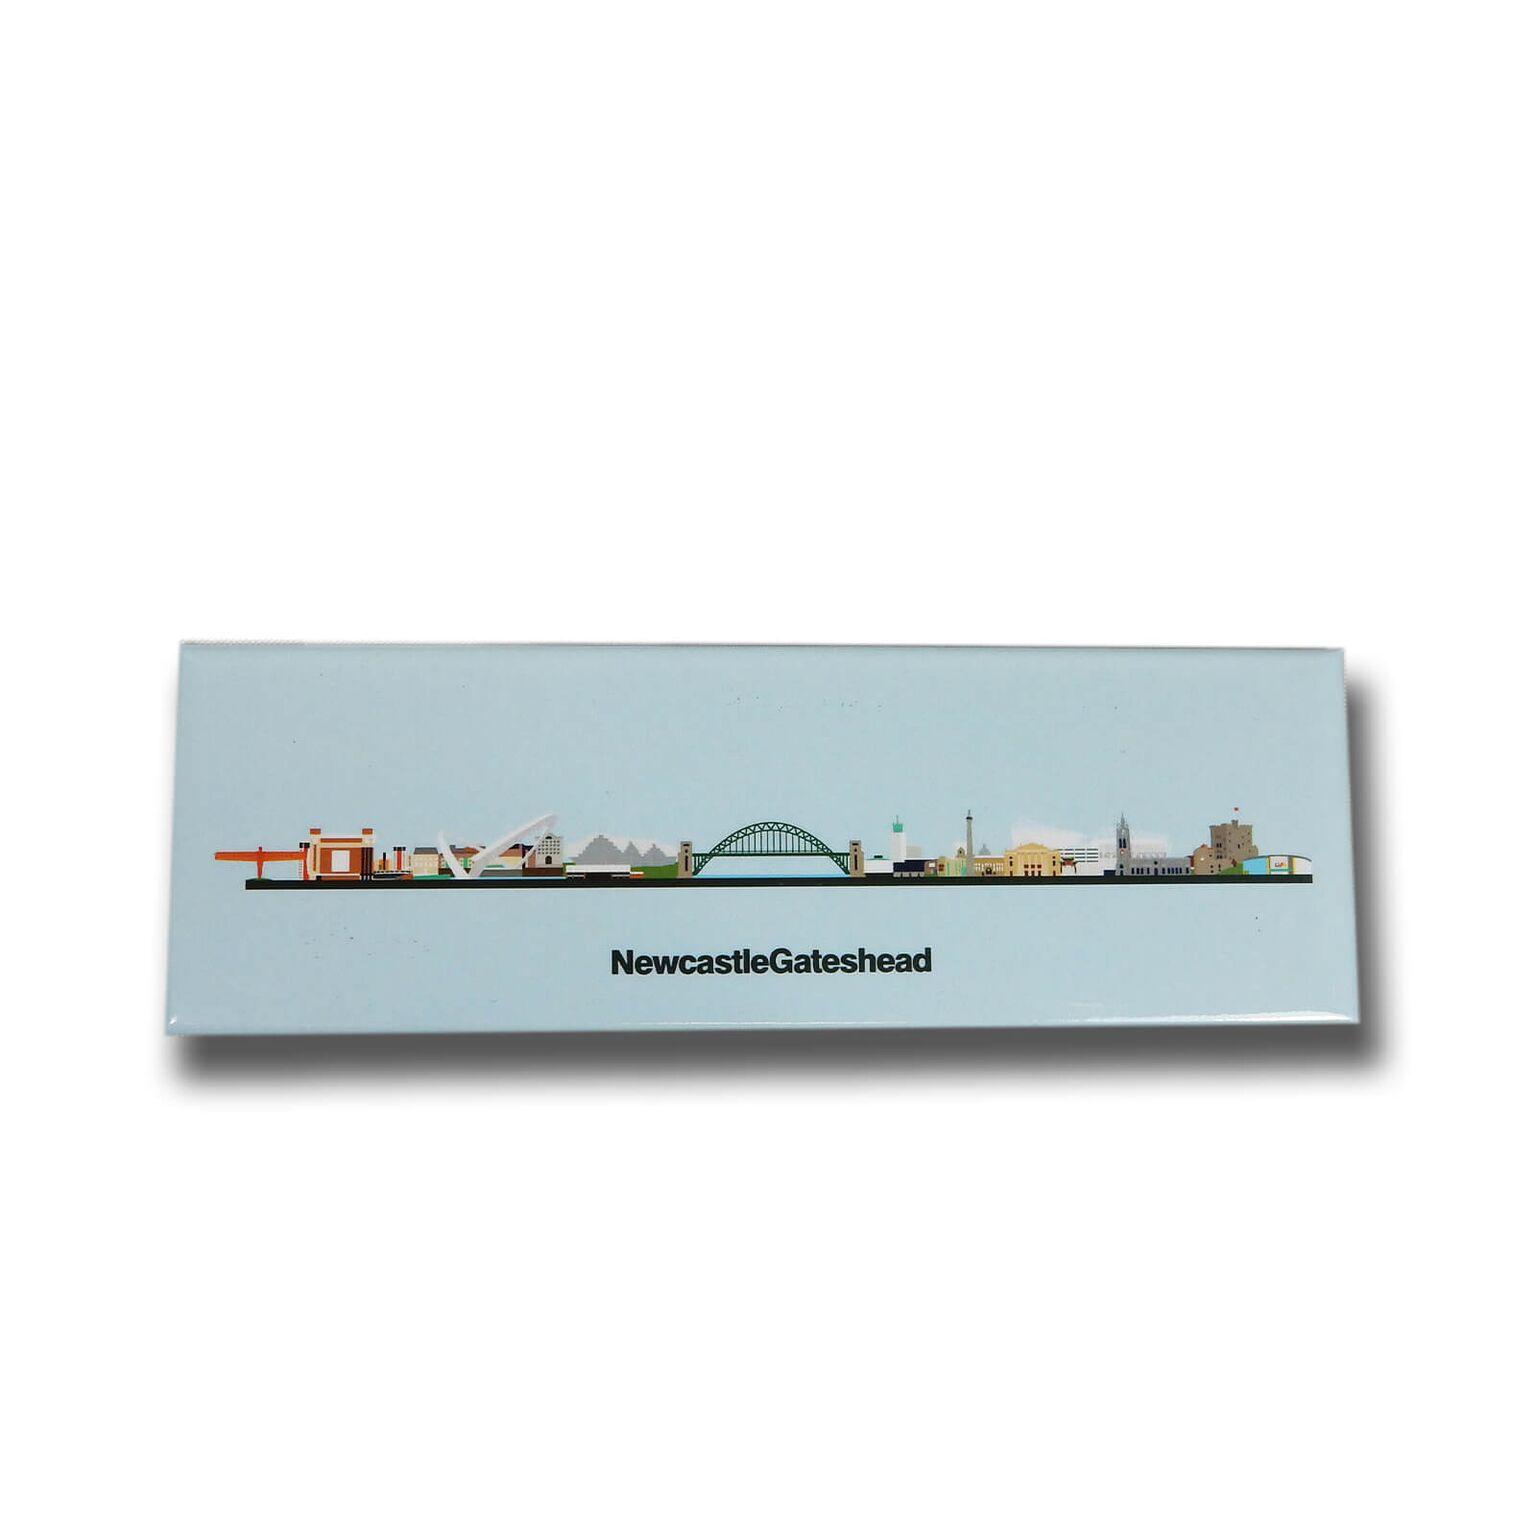 Newcastle & Gateshead Skyline Illustrated Panoramic Magnets